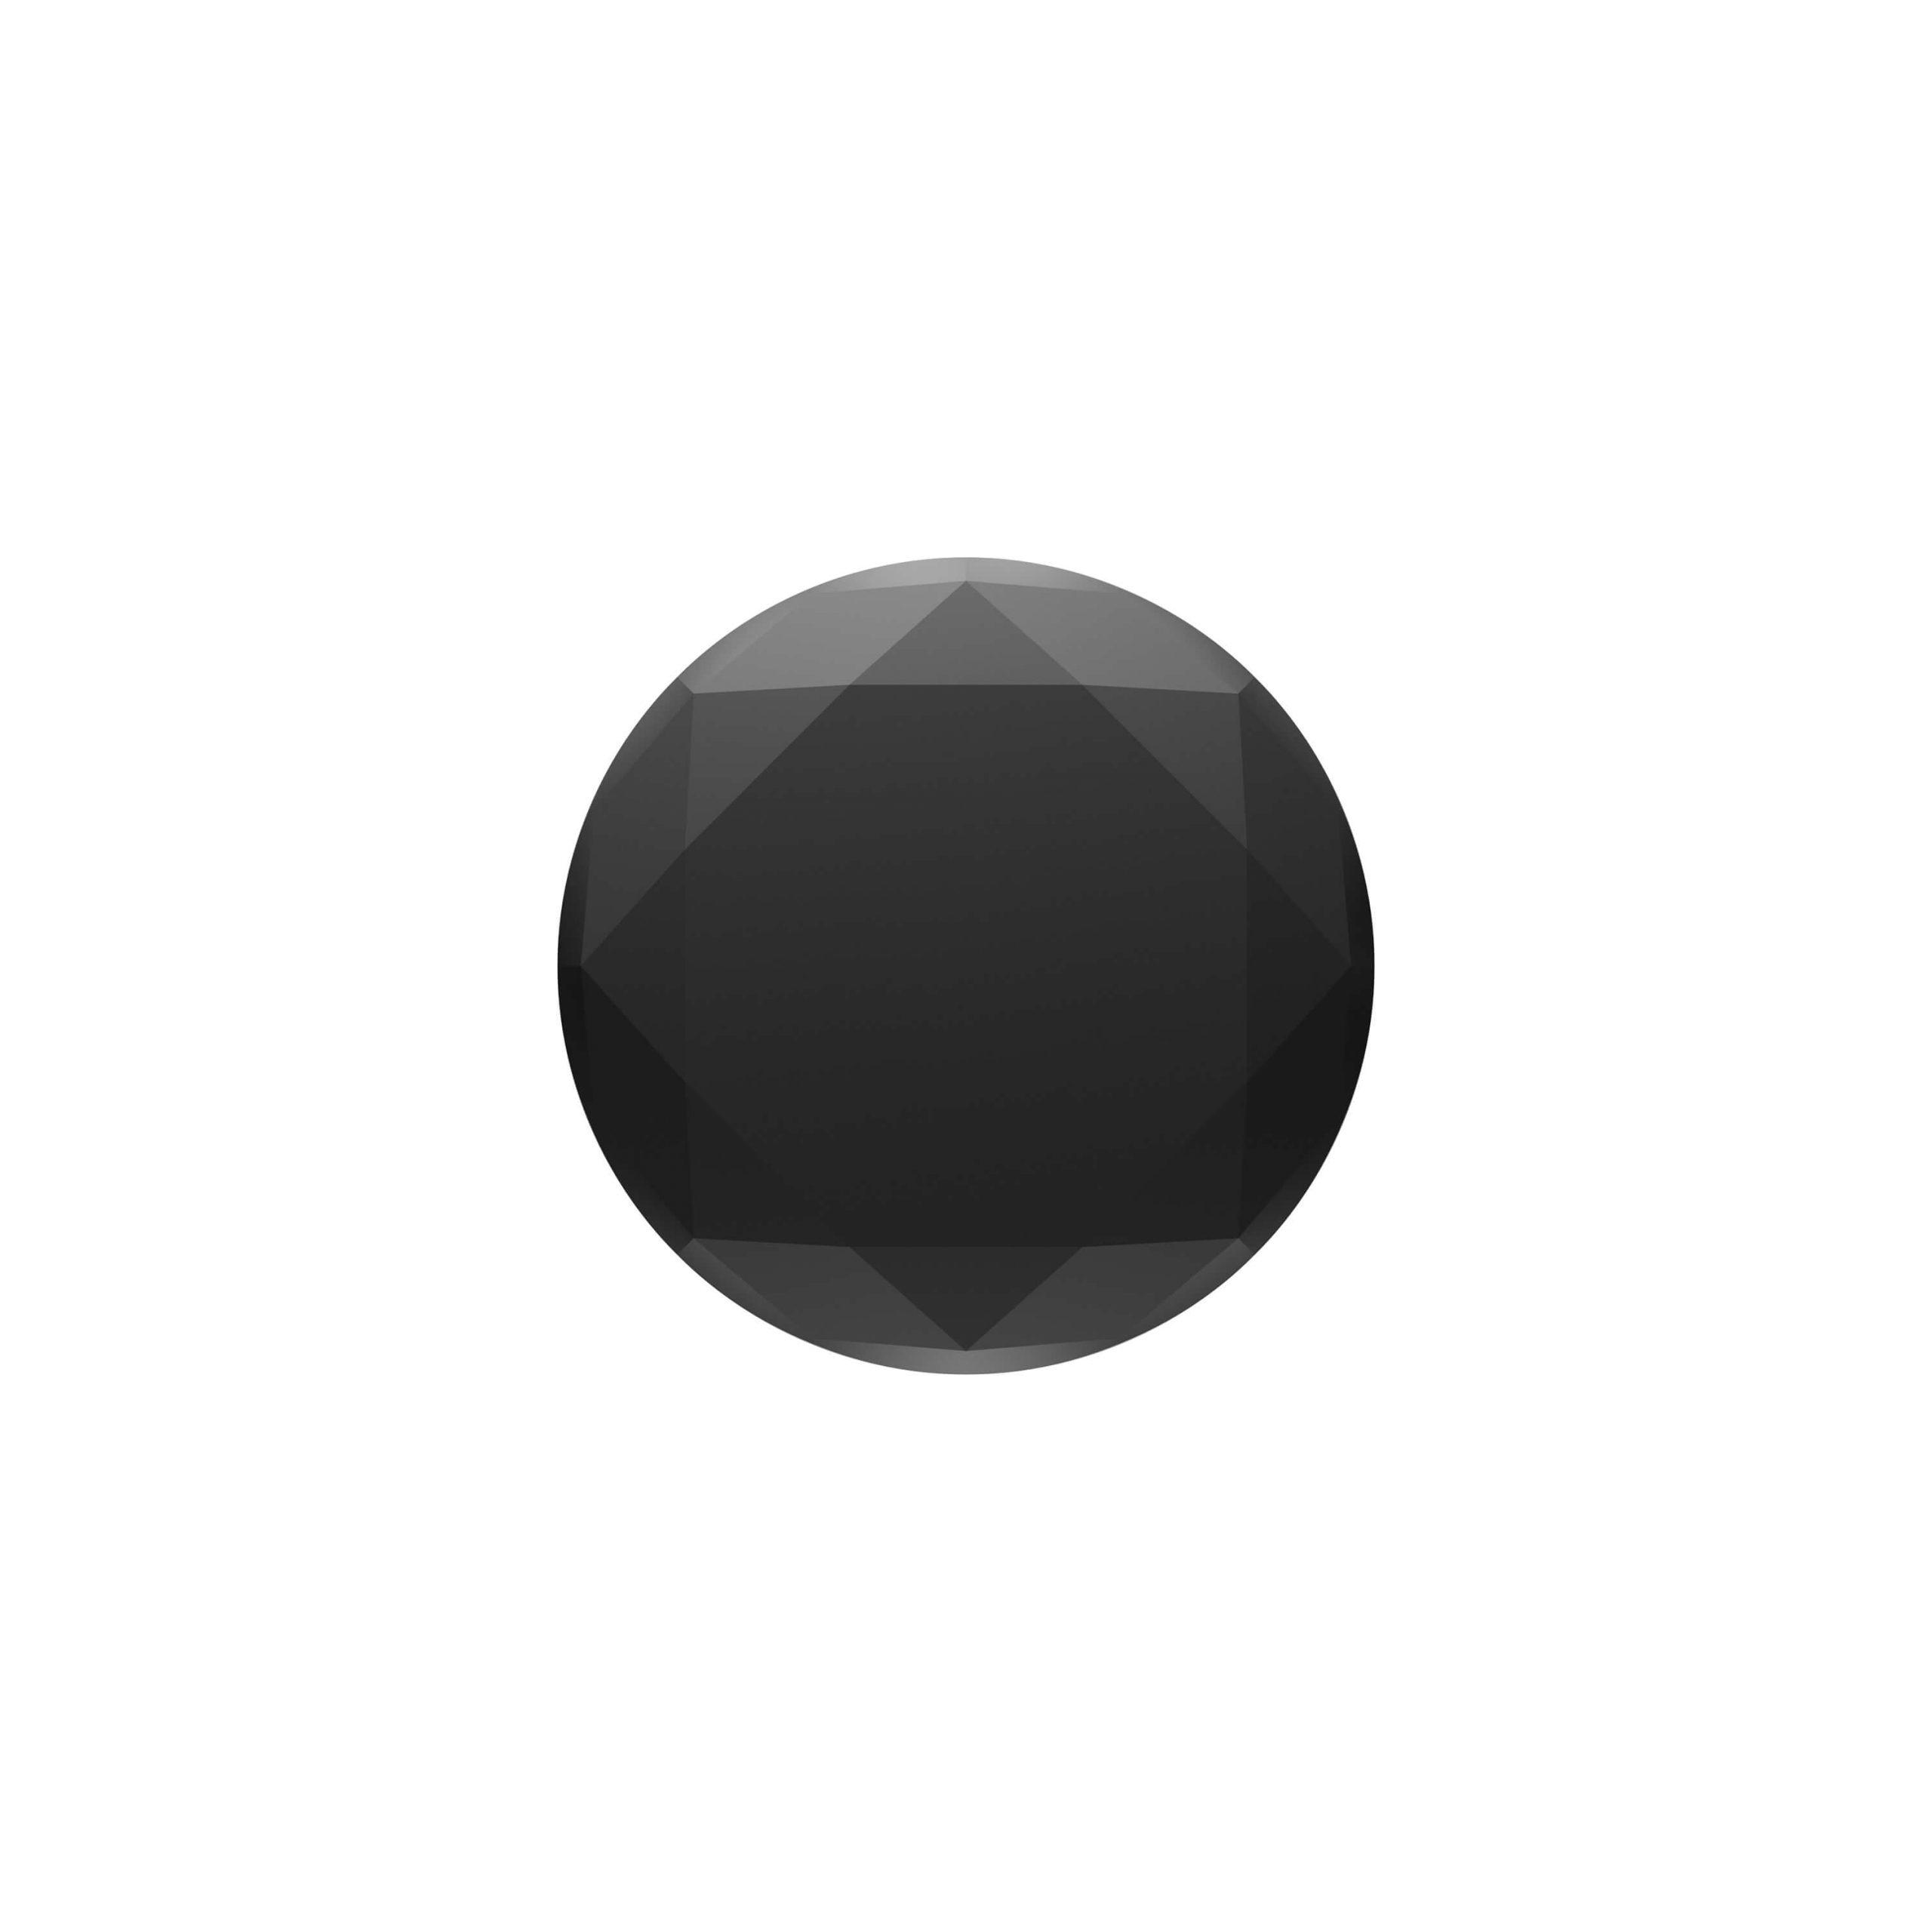 POPSOCKETS Metallic Diamond Black Avtagbart Grip med Ställfunktion Premium